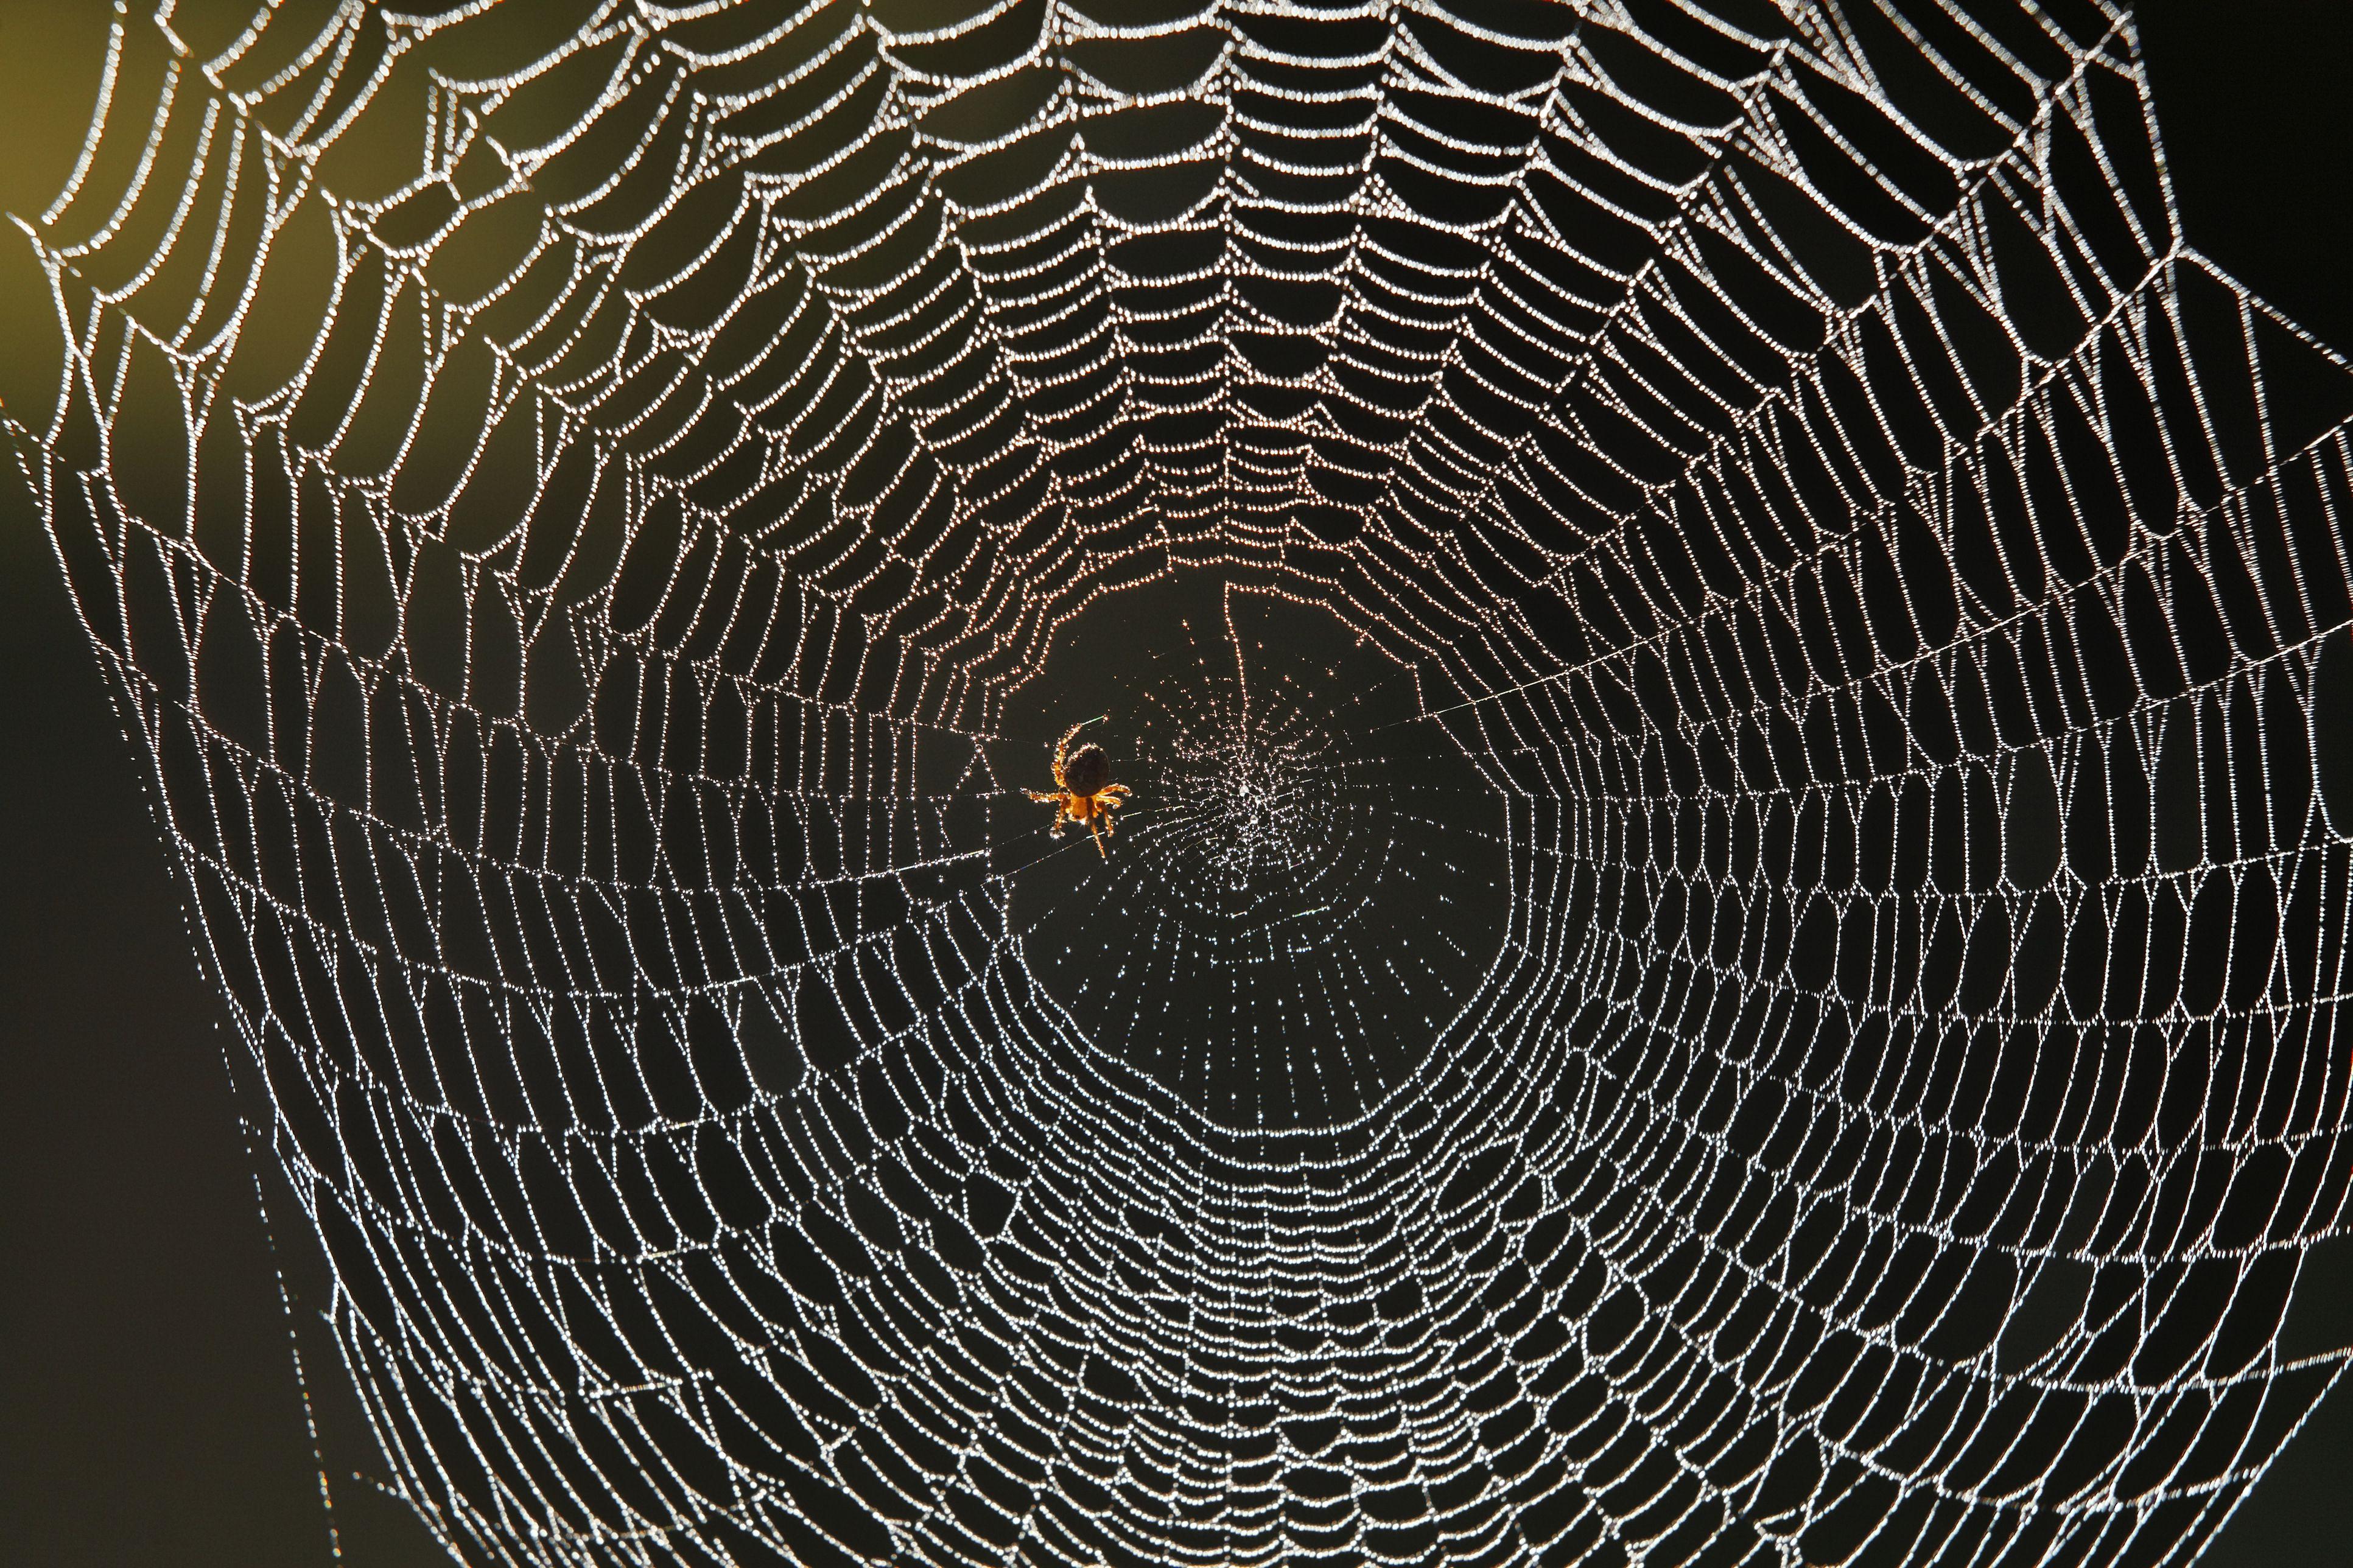 France, Vaucluse, Luberon, Spiber web dewy